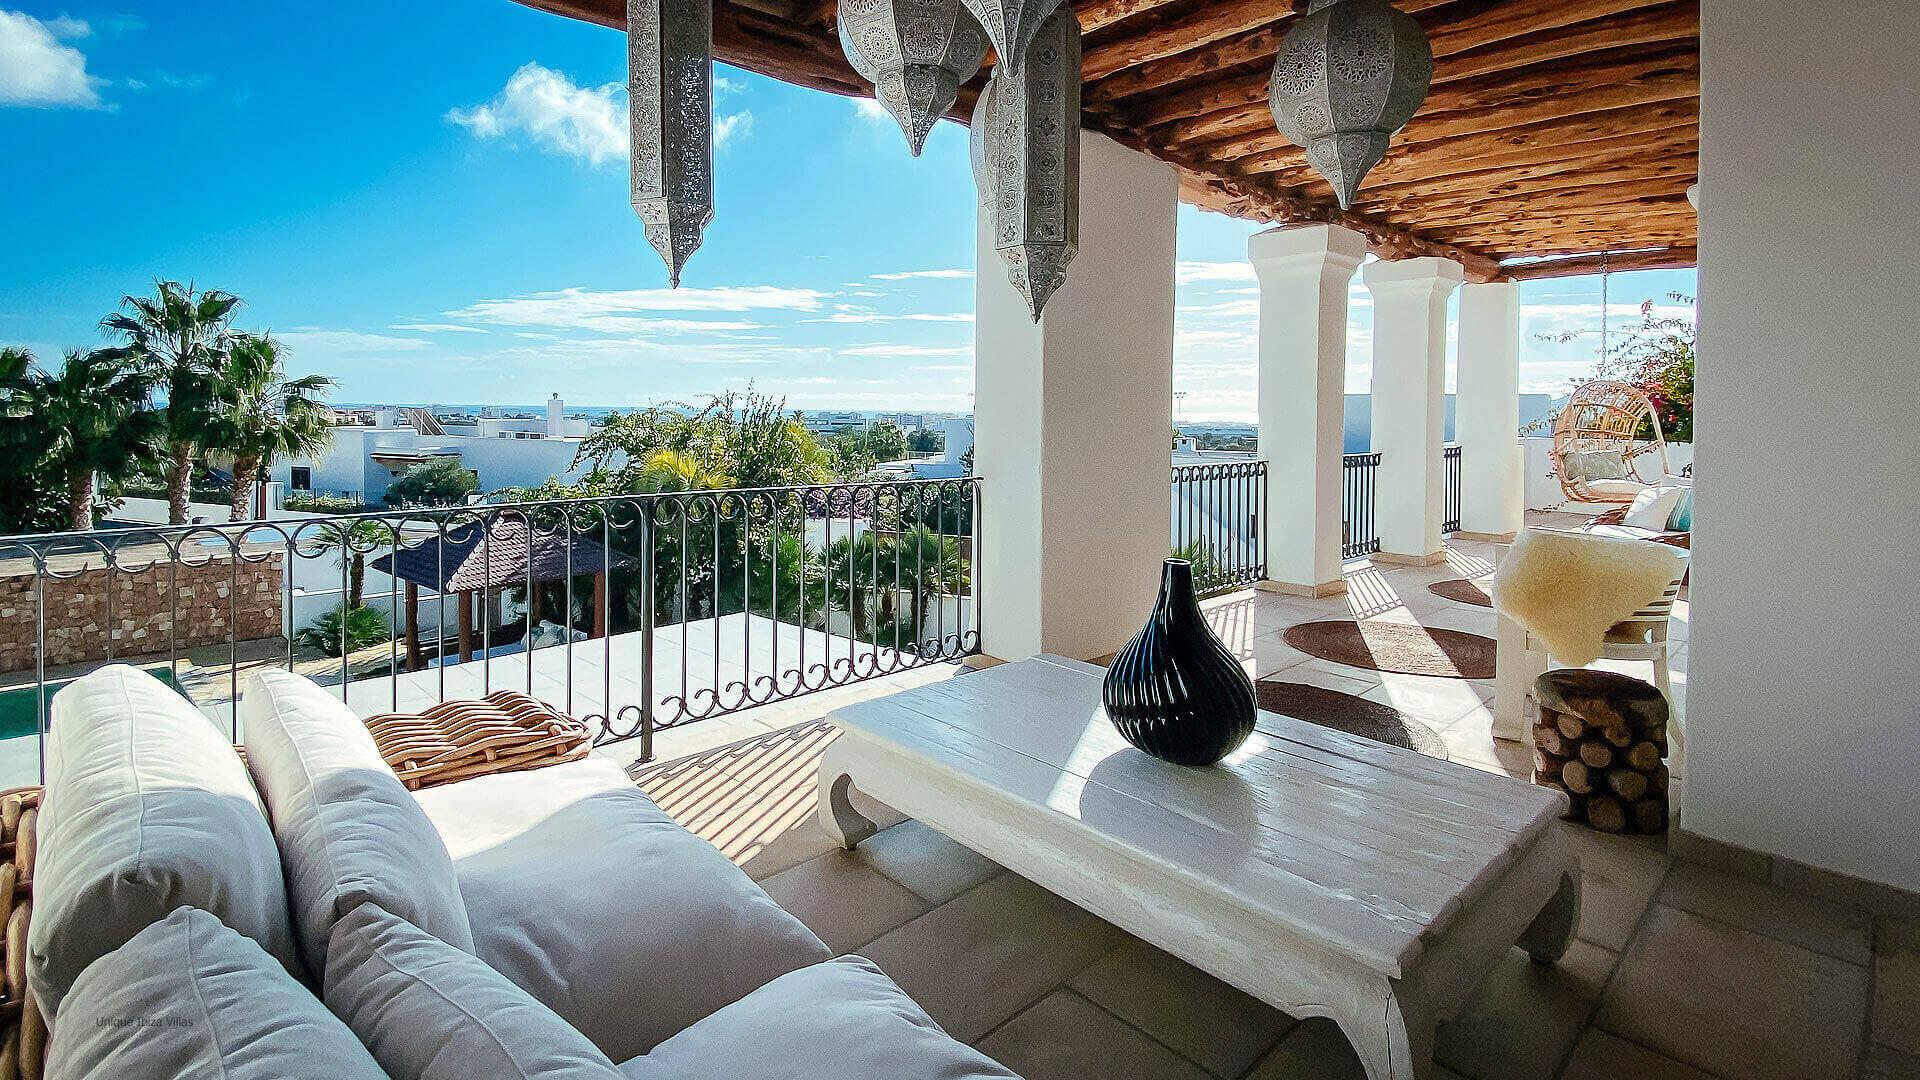 Villa El Secreto Ibiza 34 Bedroom 1 And 2 Terrace